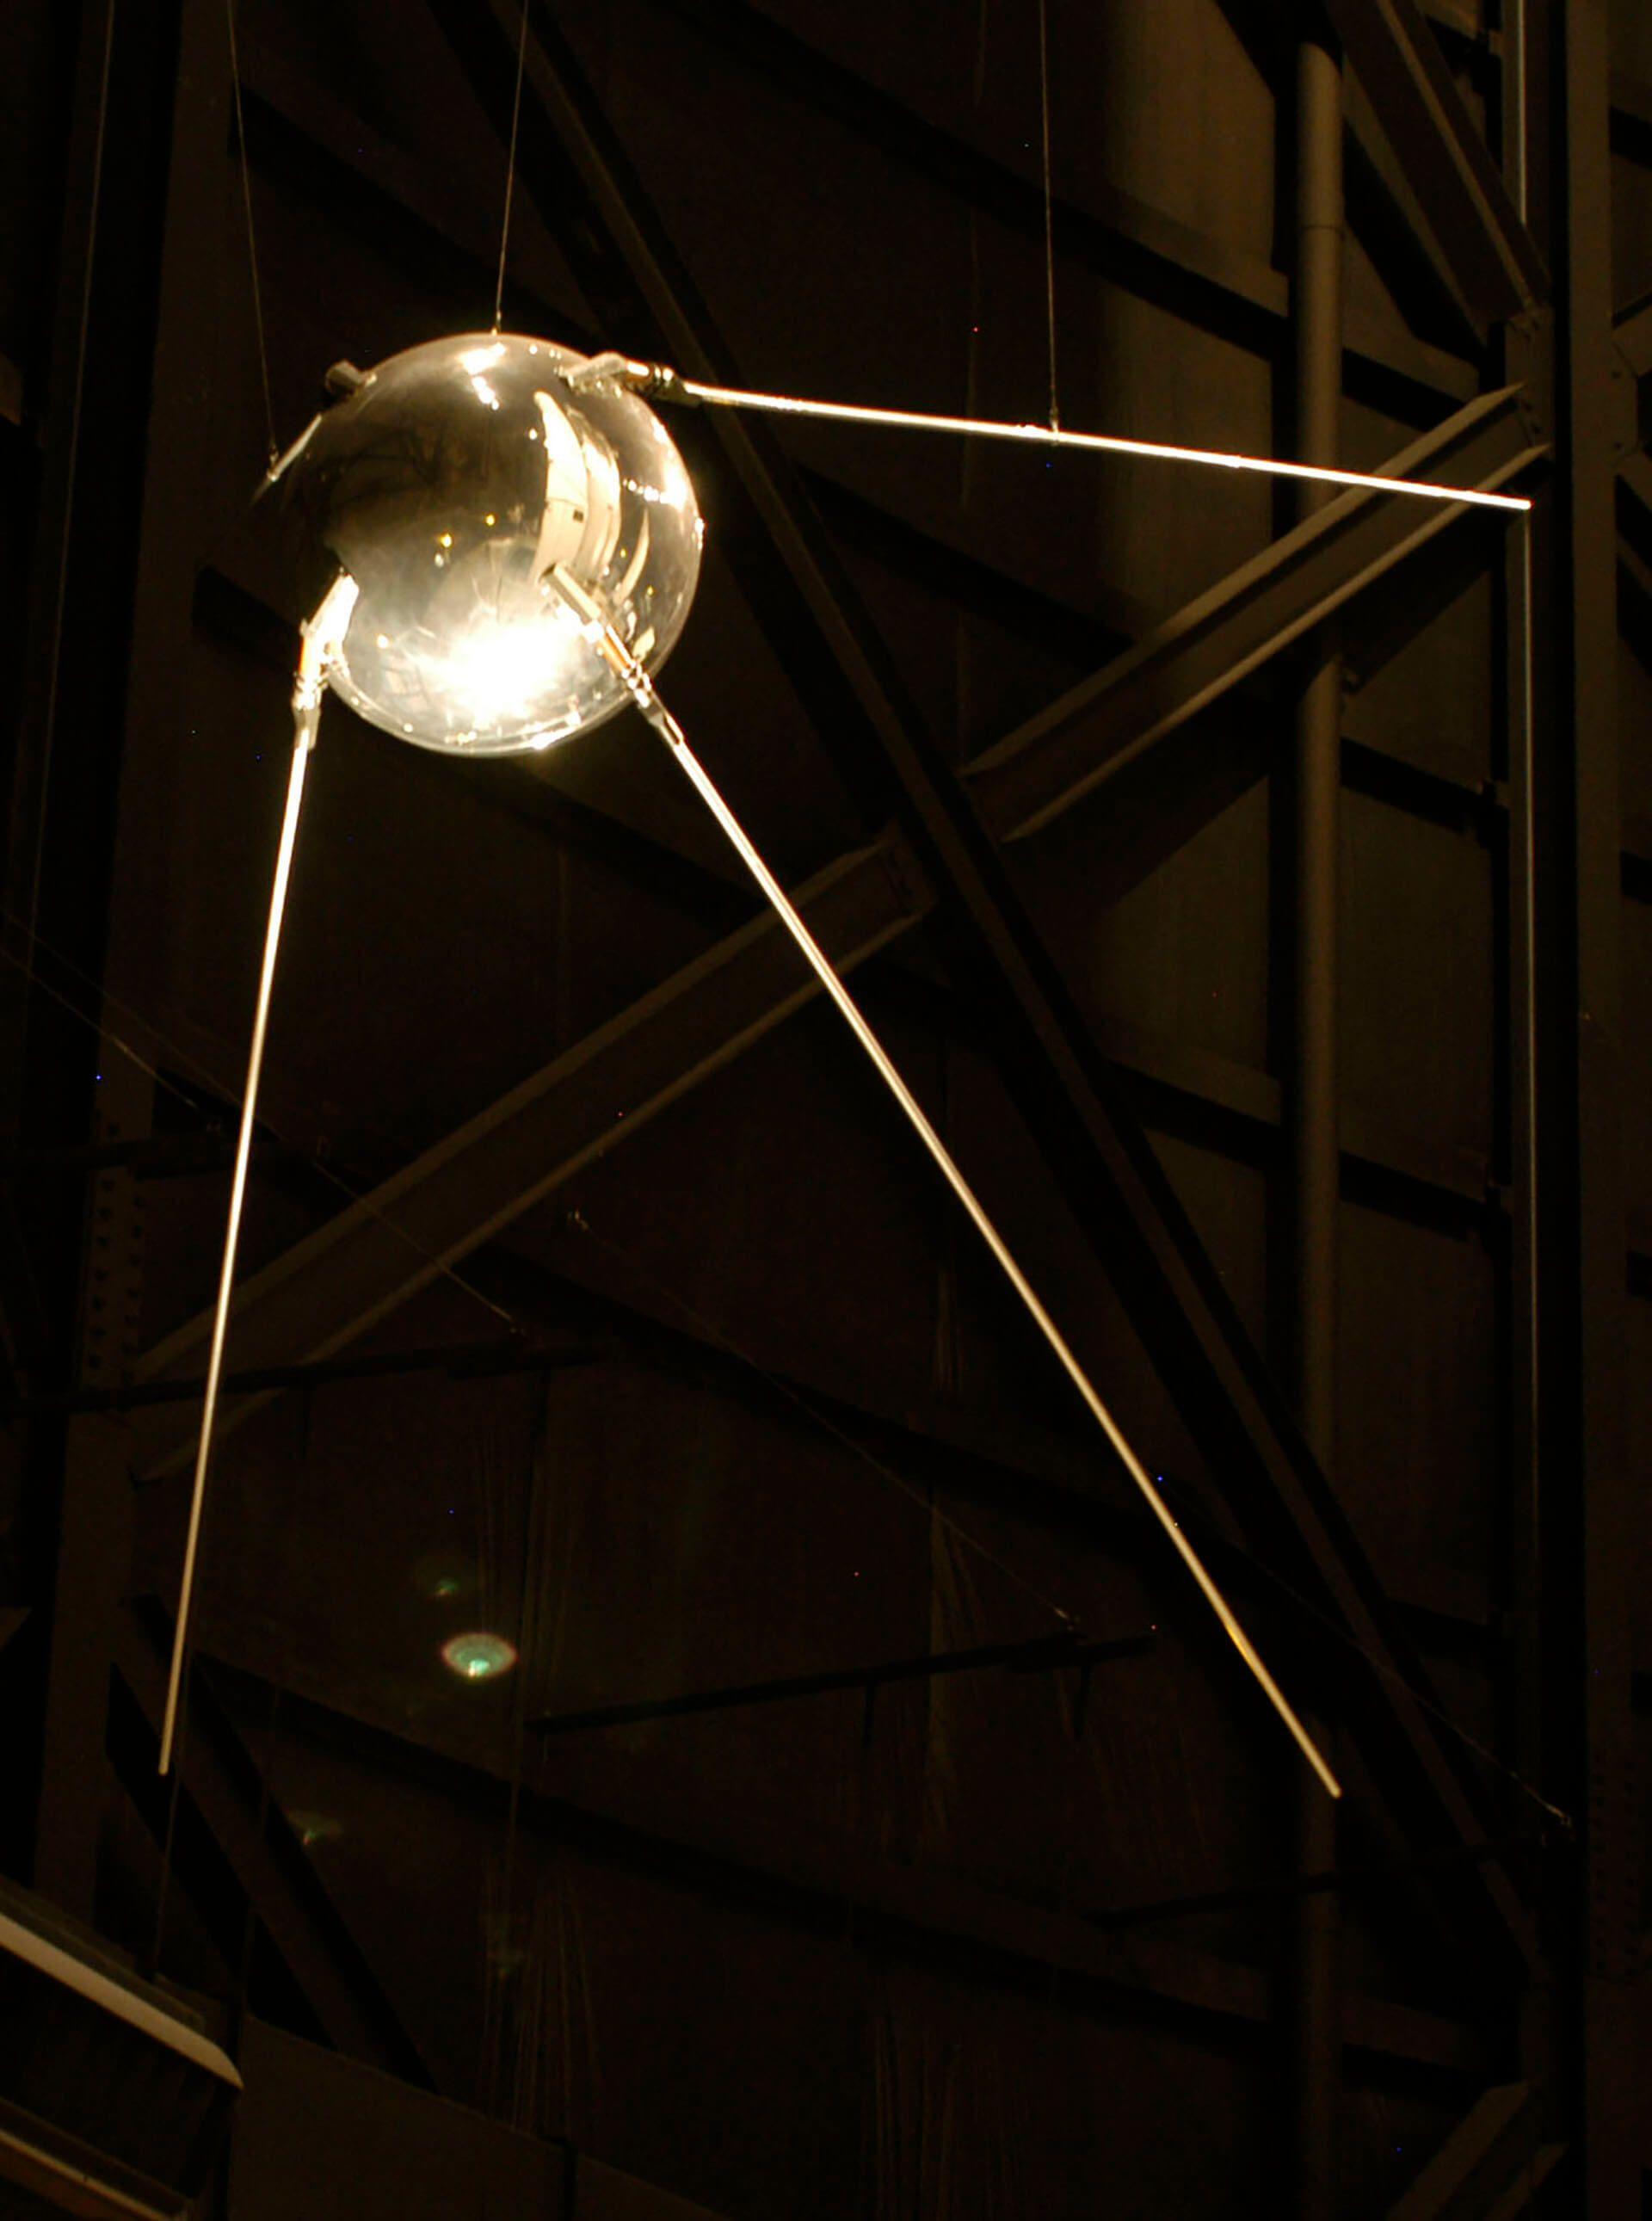 satelite soviético sputnik 1 carrera espacial